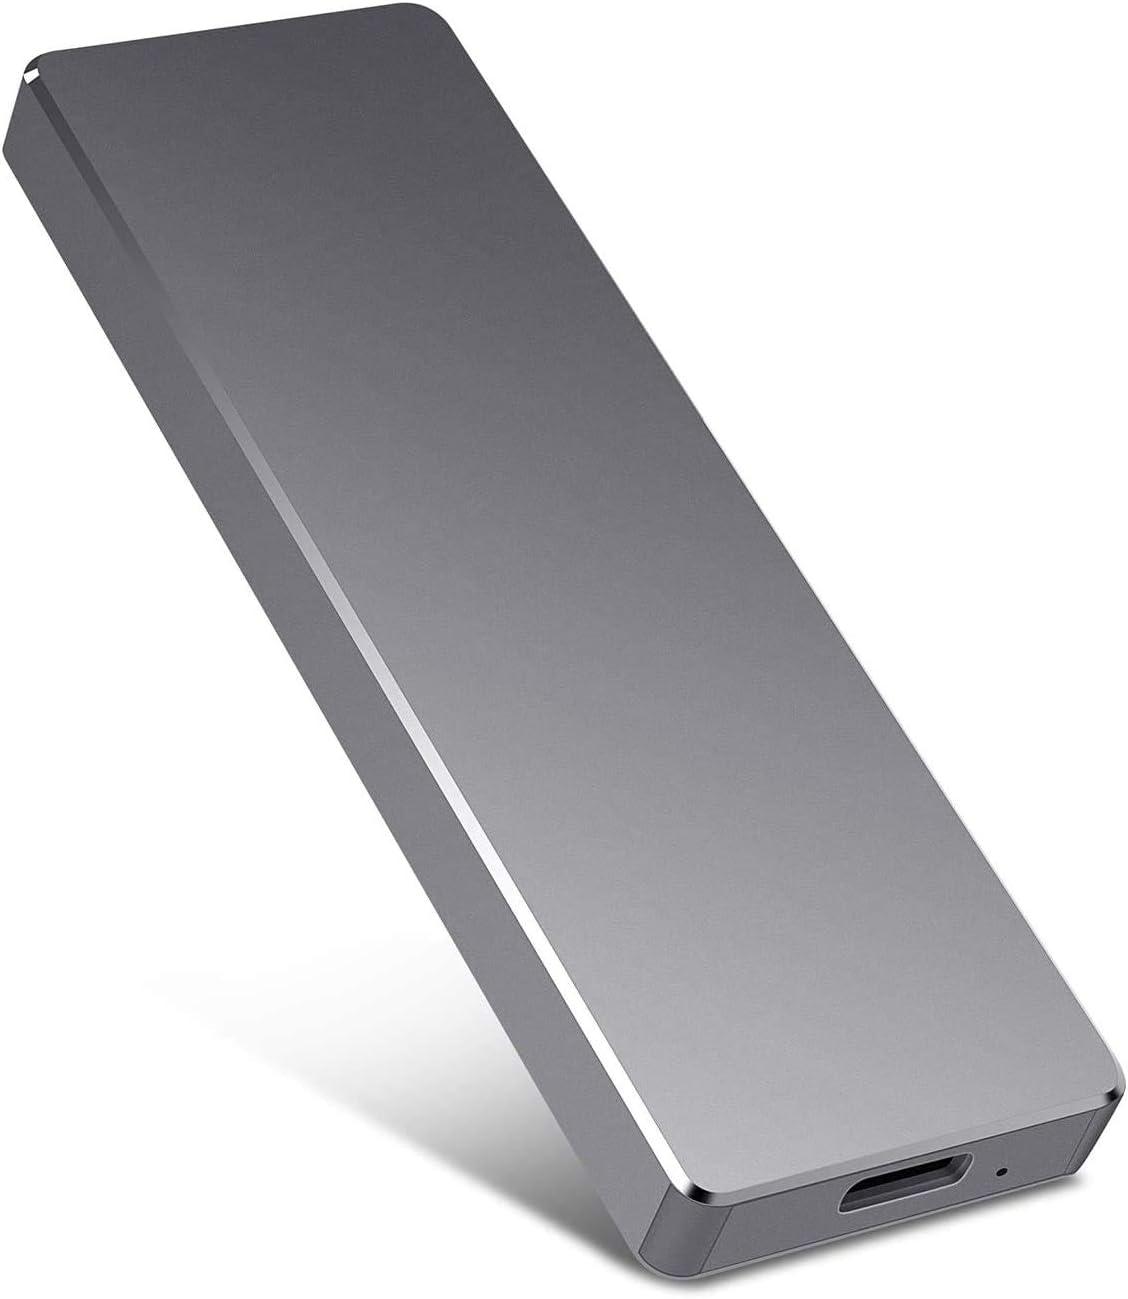 External Hard Drive, Hard Drive Portable Slim External Hard Drive USB 3.0 1TB 2TB Compatible with PC, Laptop and Mac(2TB Black)